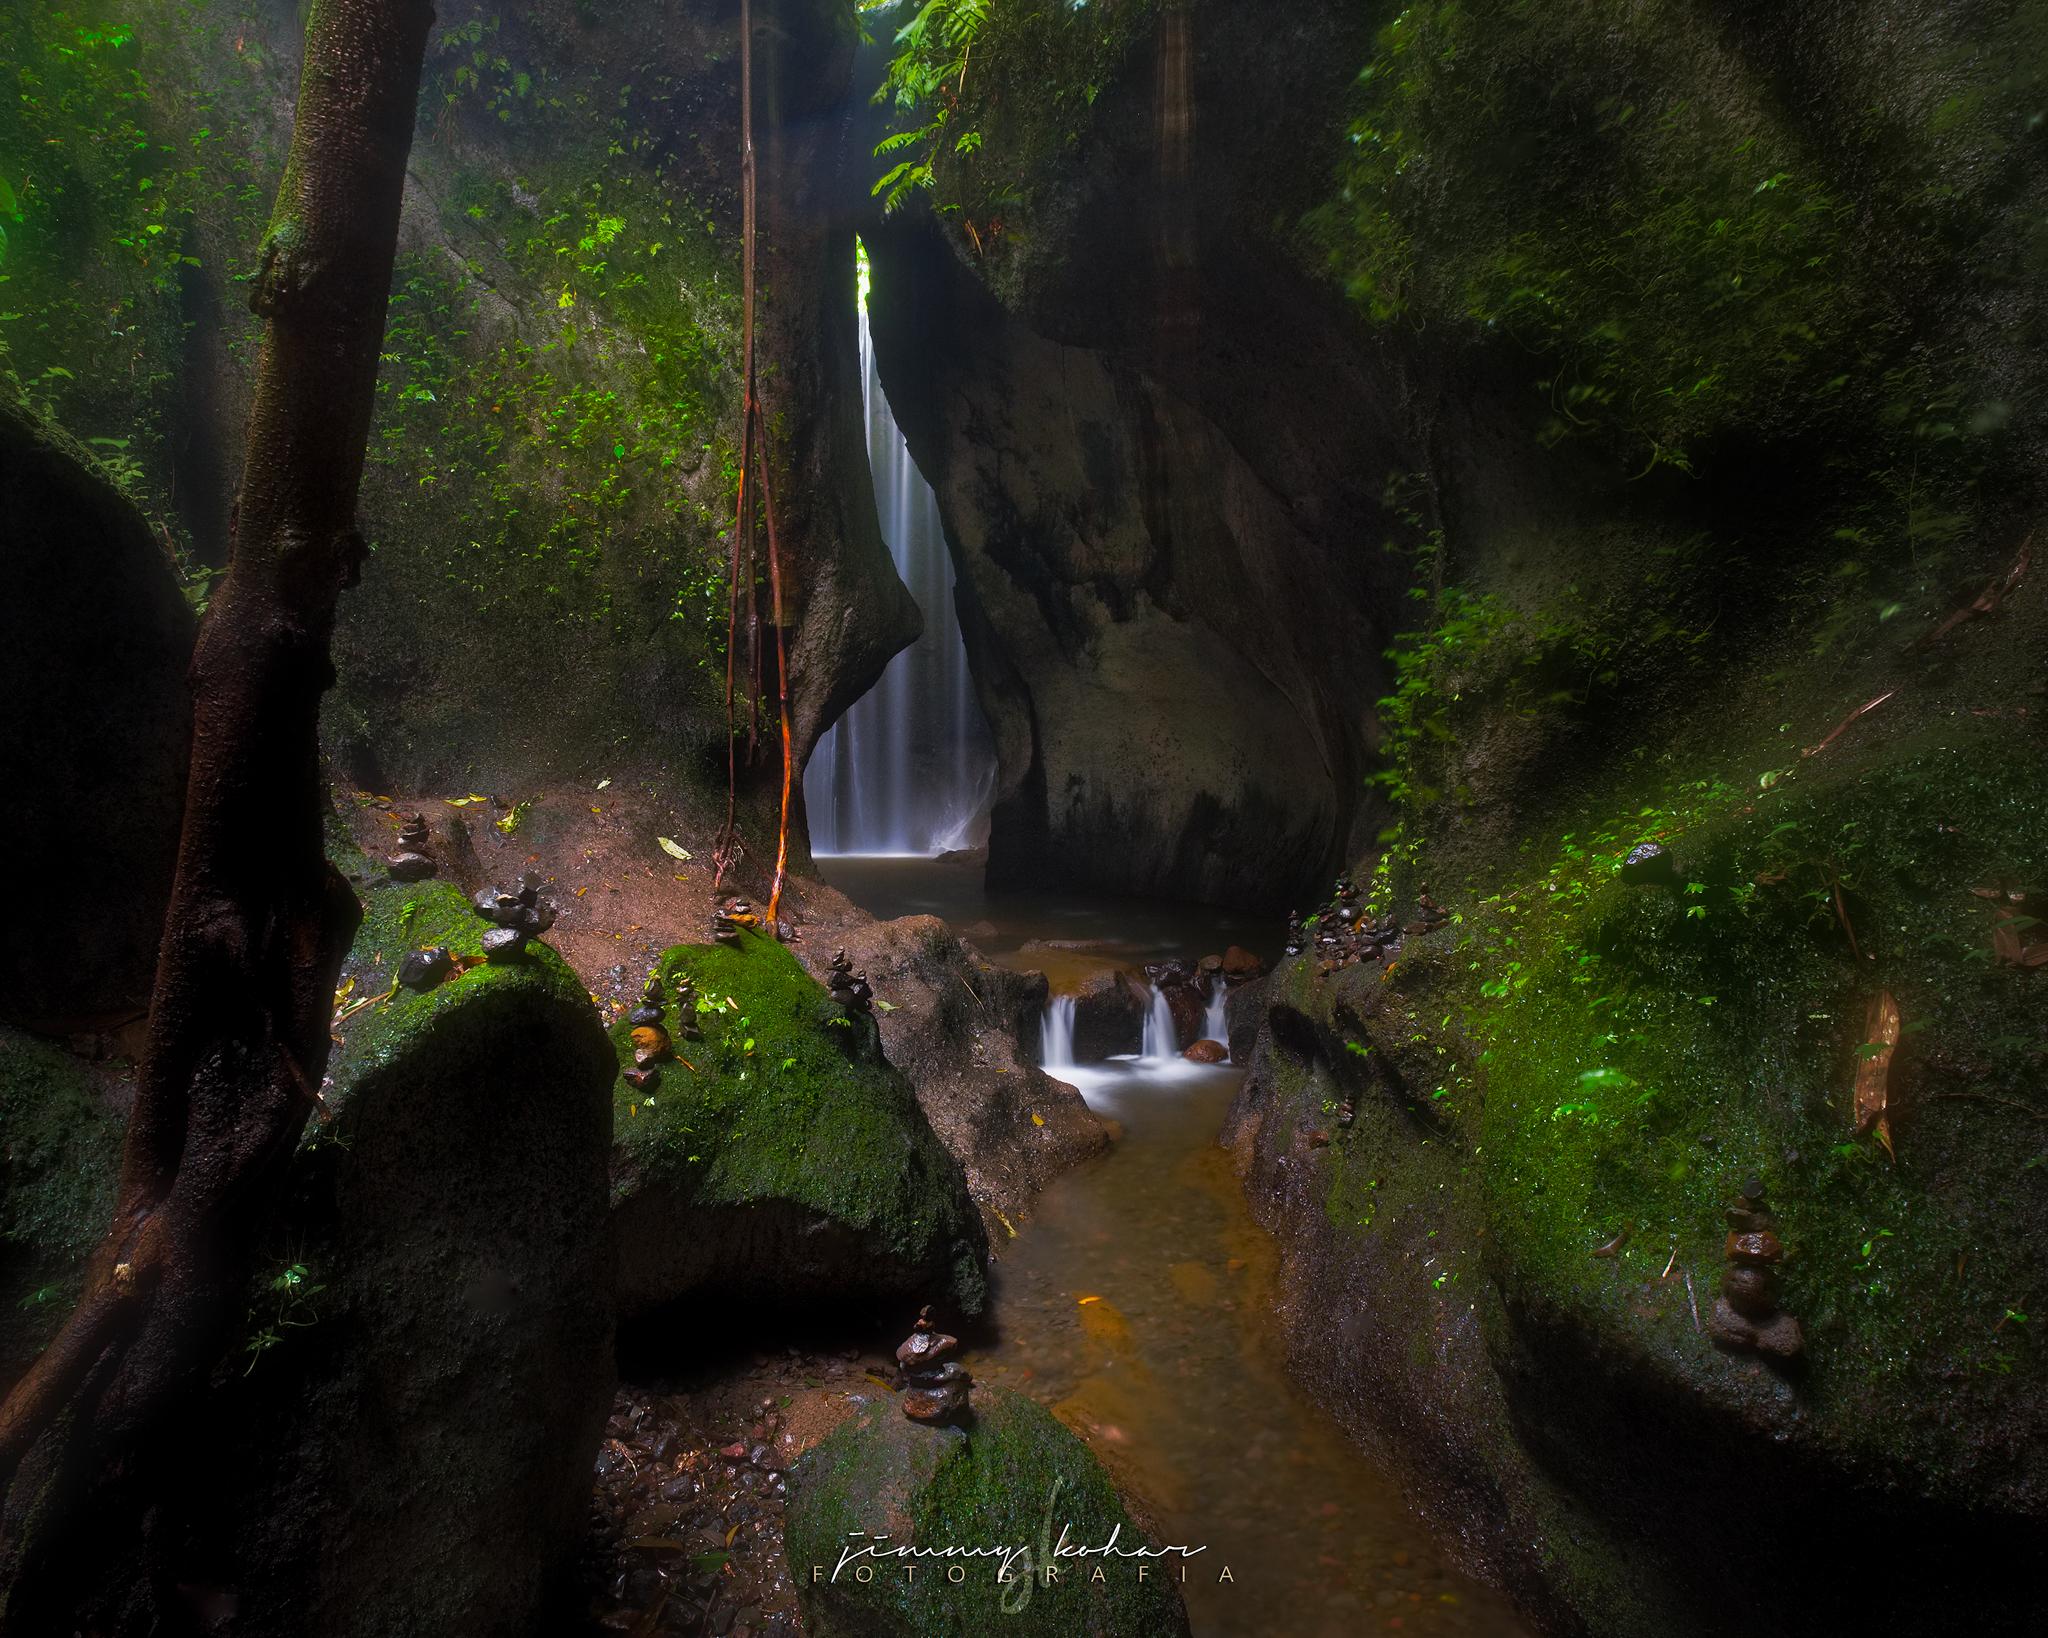 Tukad Cepung Waterfall, Indonesia